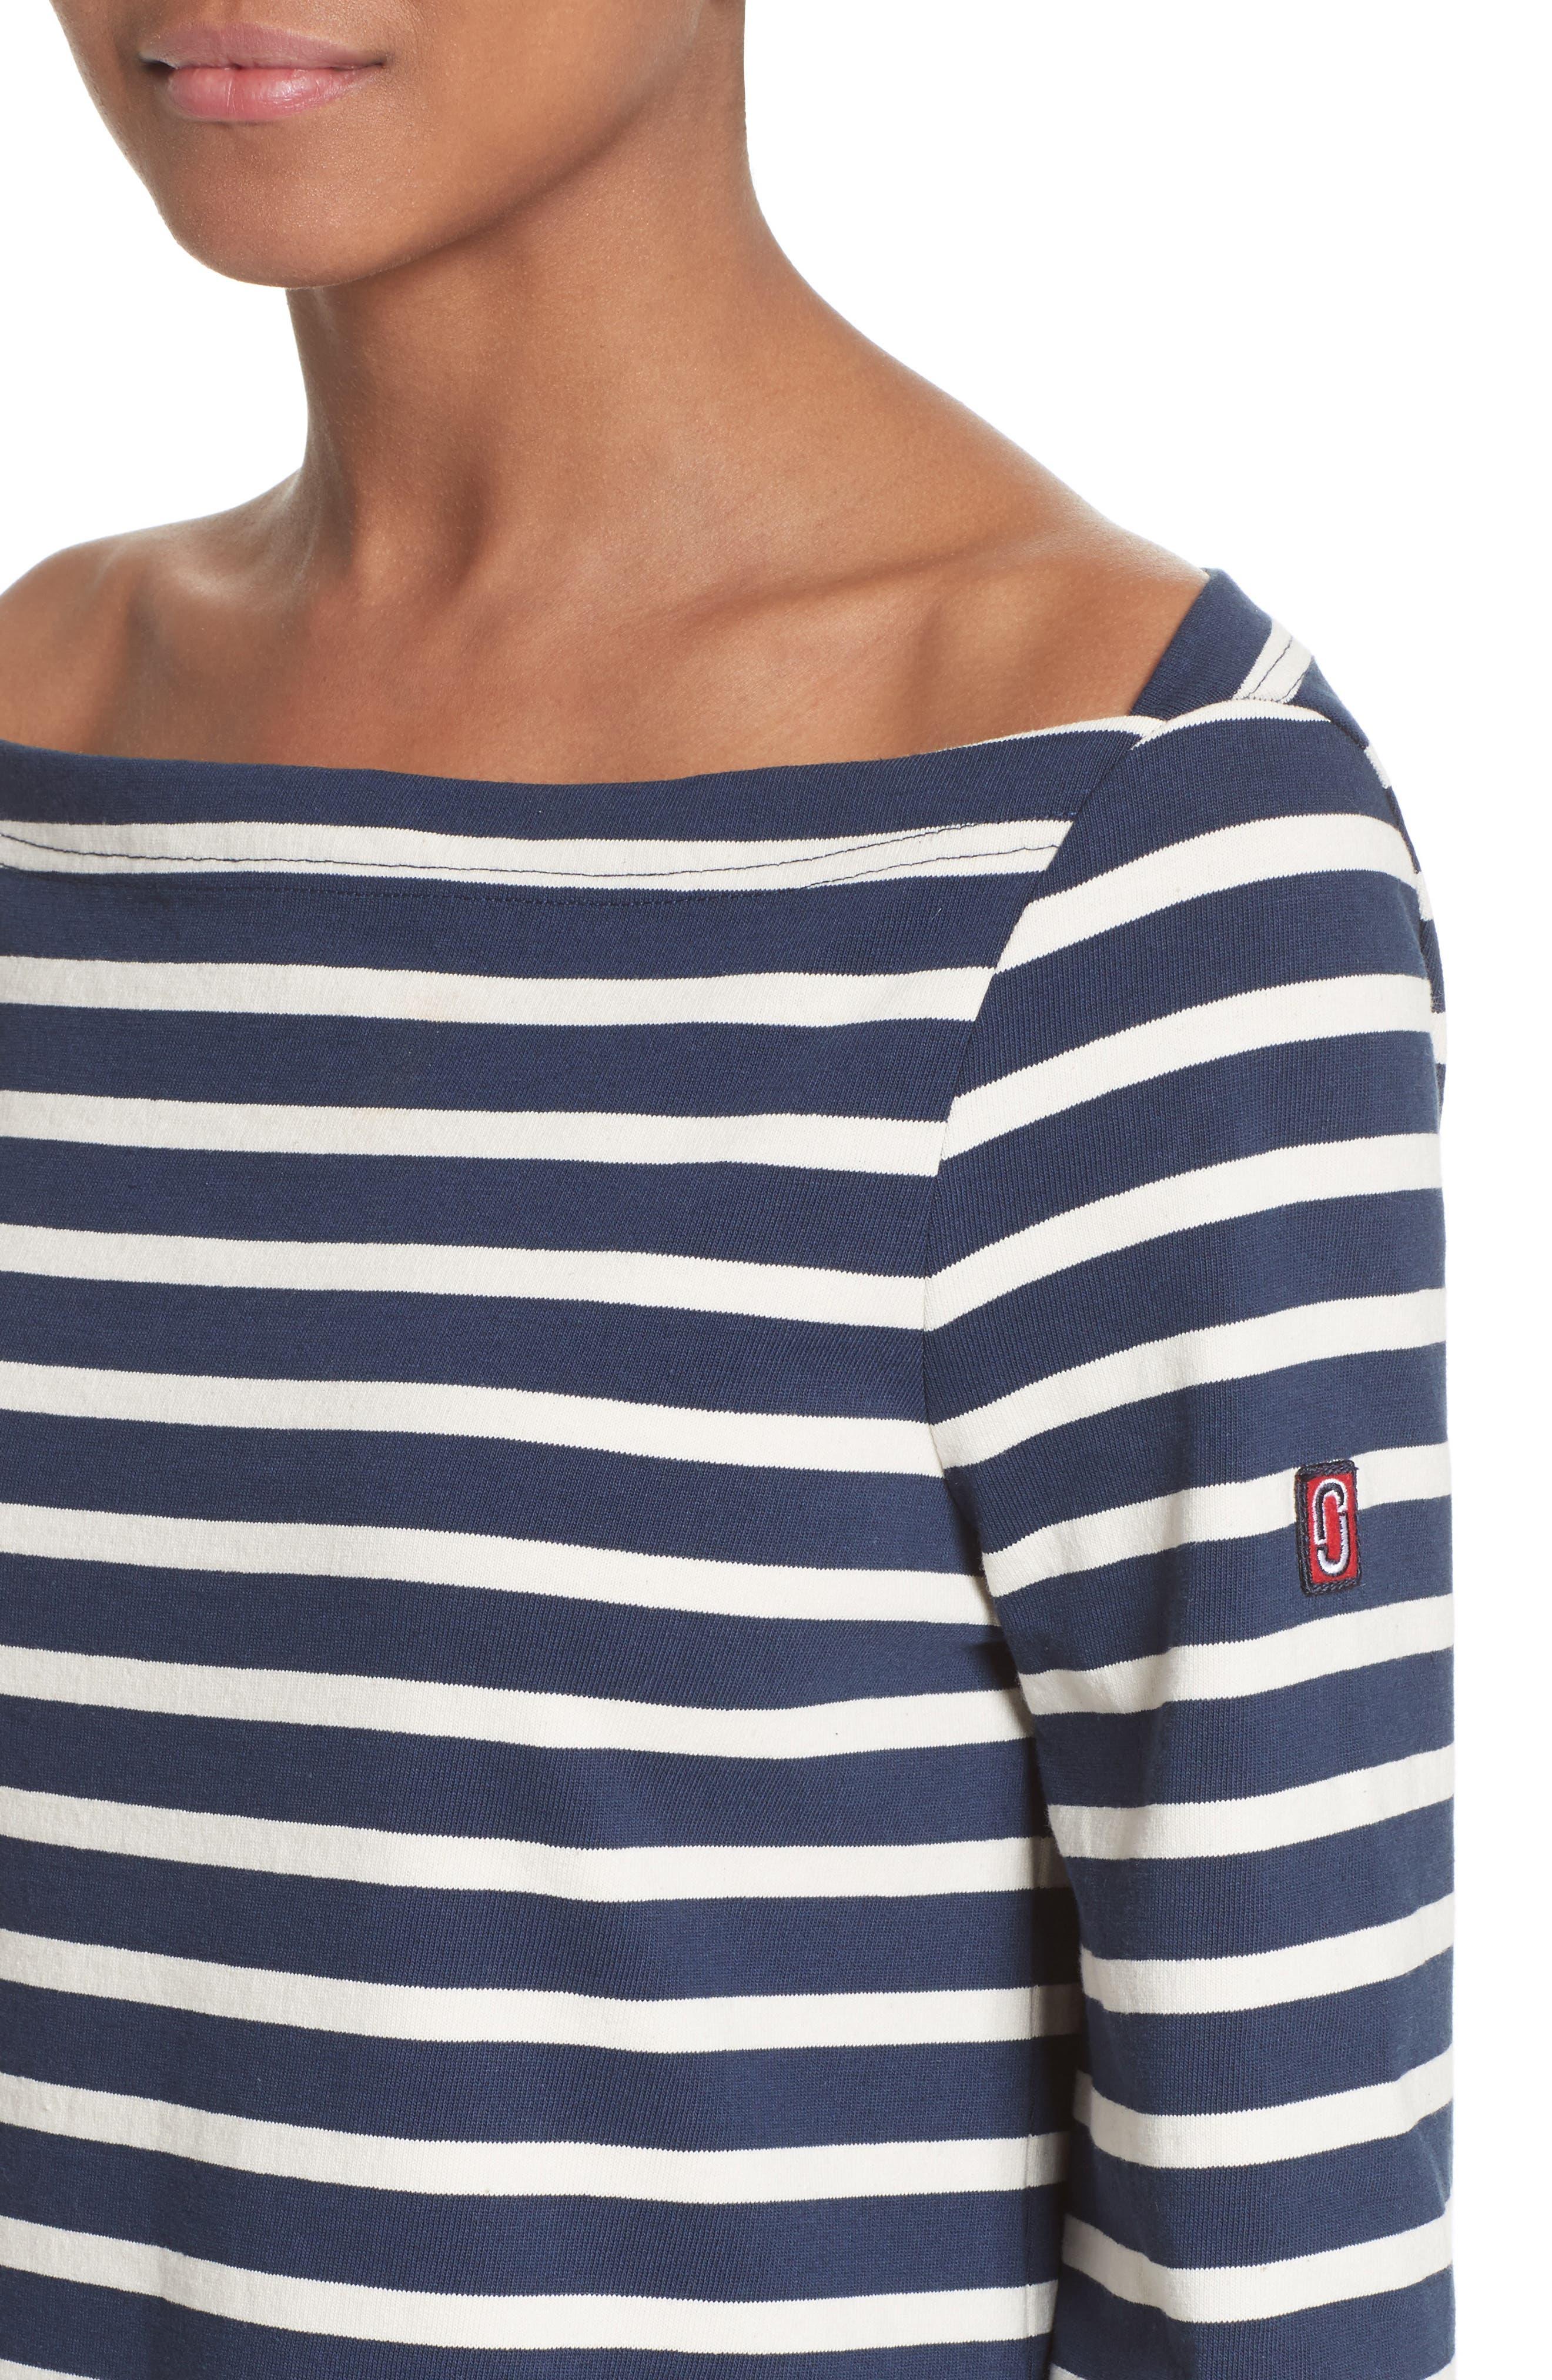 Reverse Breton Stripe Dress,                             Alternate thumbnail 8, color,                             Navy/ Ecru